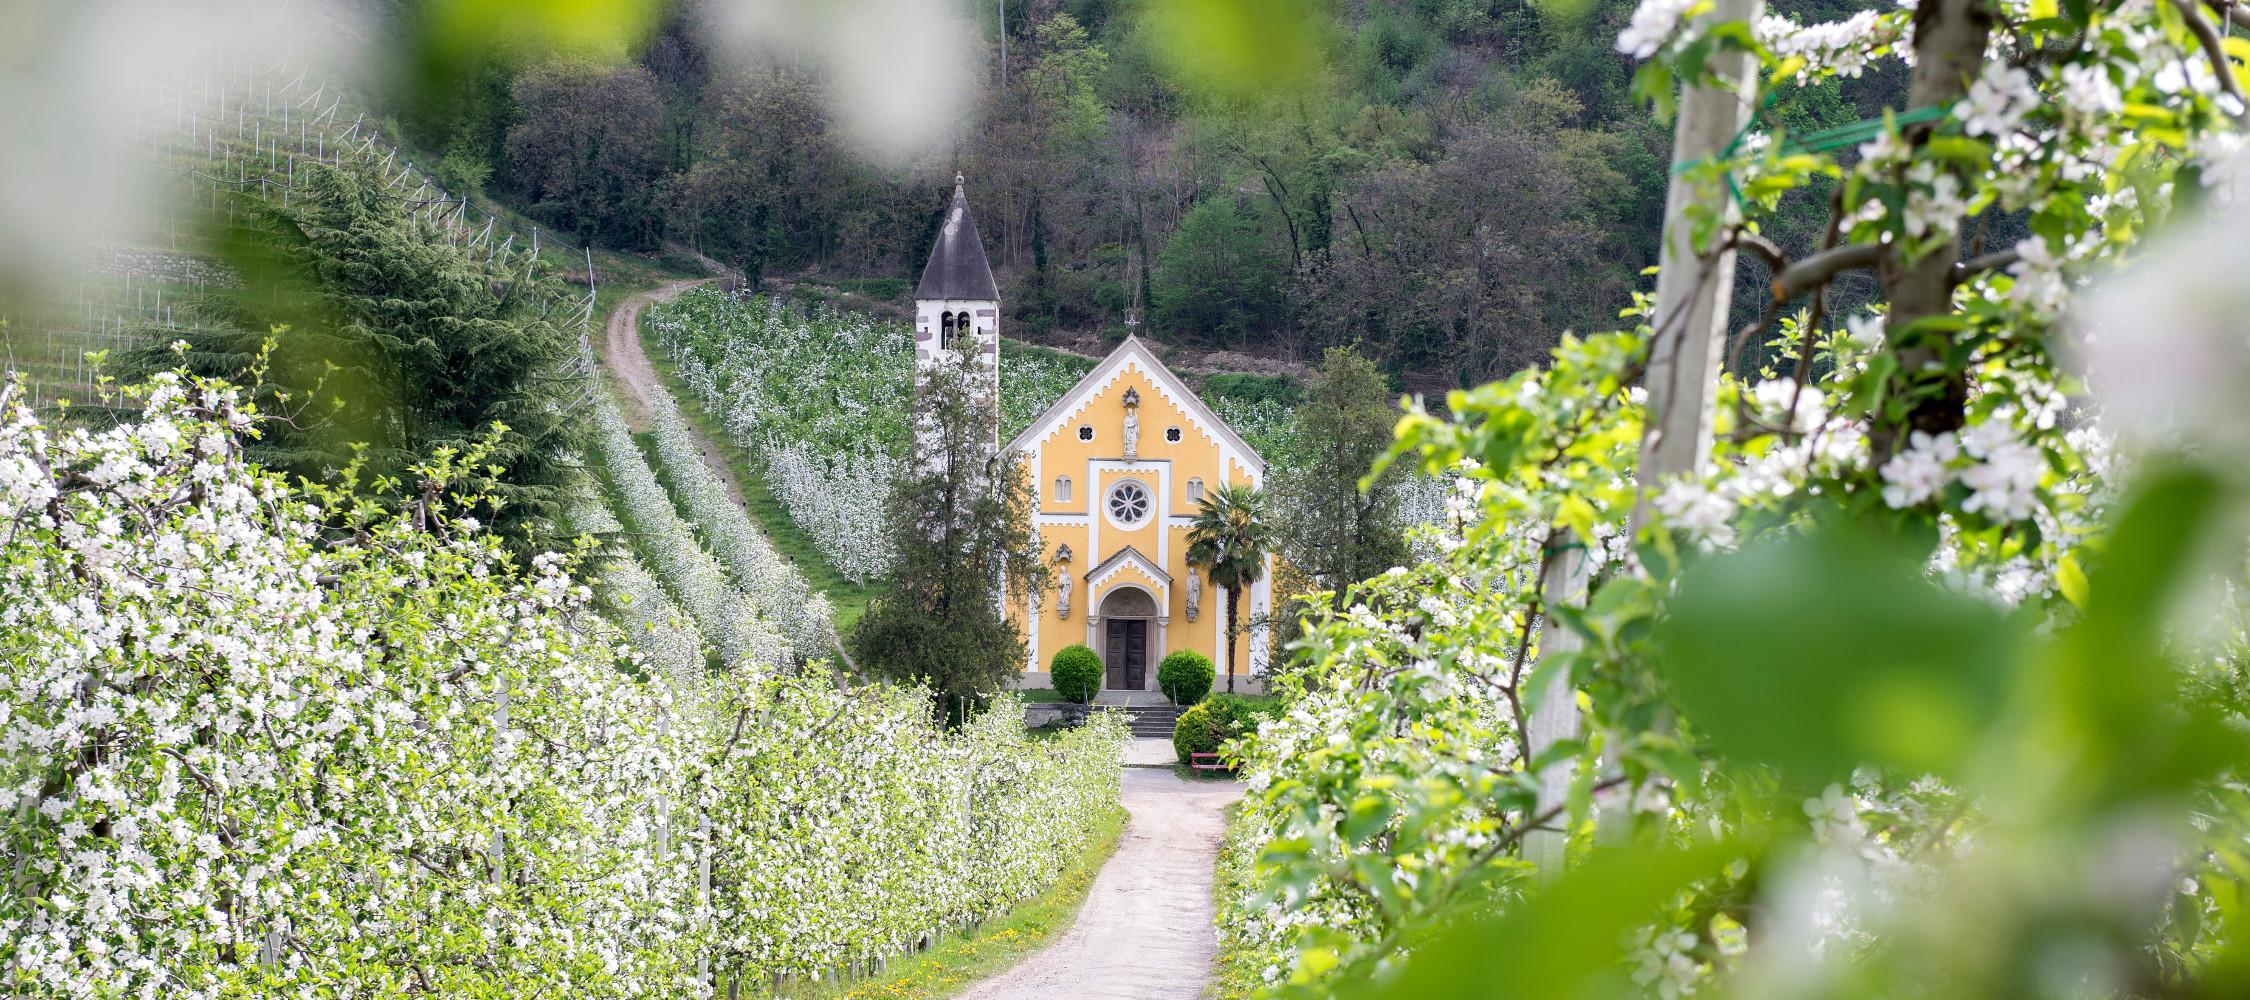 Italien-Trentino_Suedtirol_Alto_Adige_Merano_Meran_Natur_Fruehling_Apfelbluete_Kurverwaltung-Meran-Alex-Filz_mgm01158kume_2250x1000